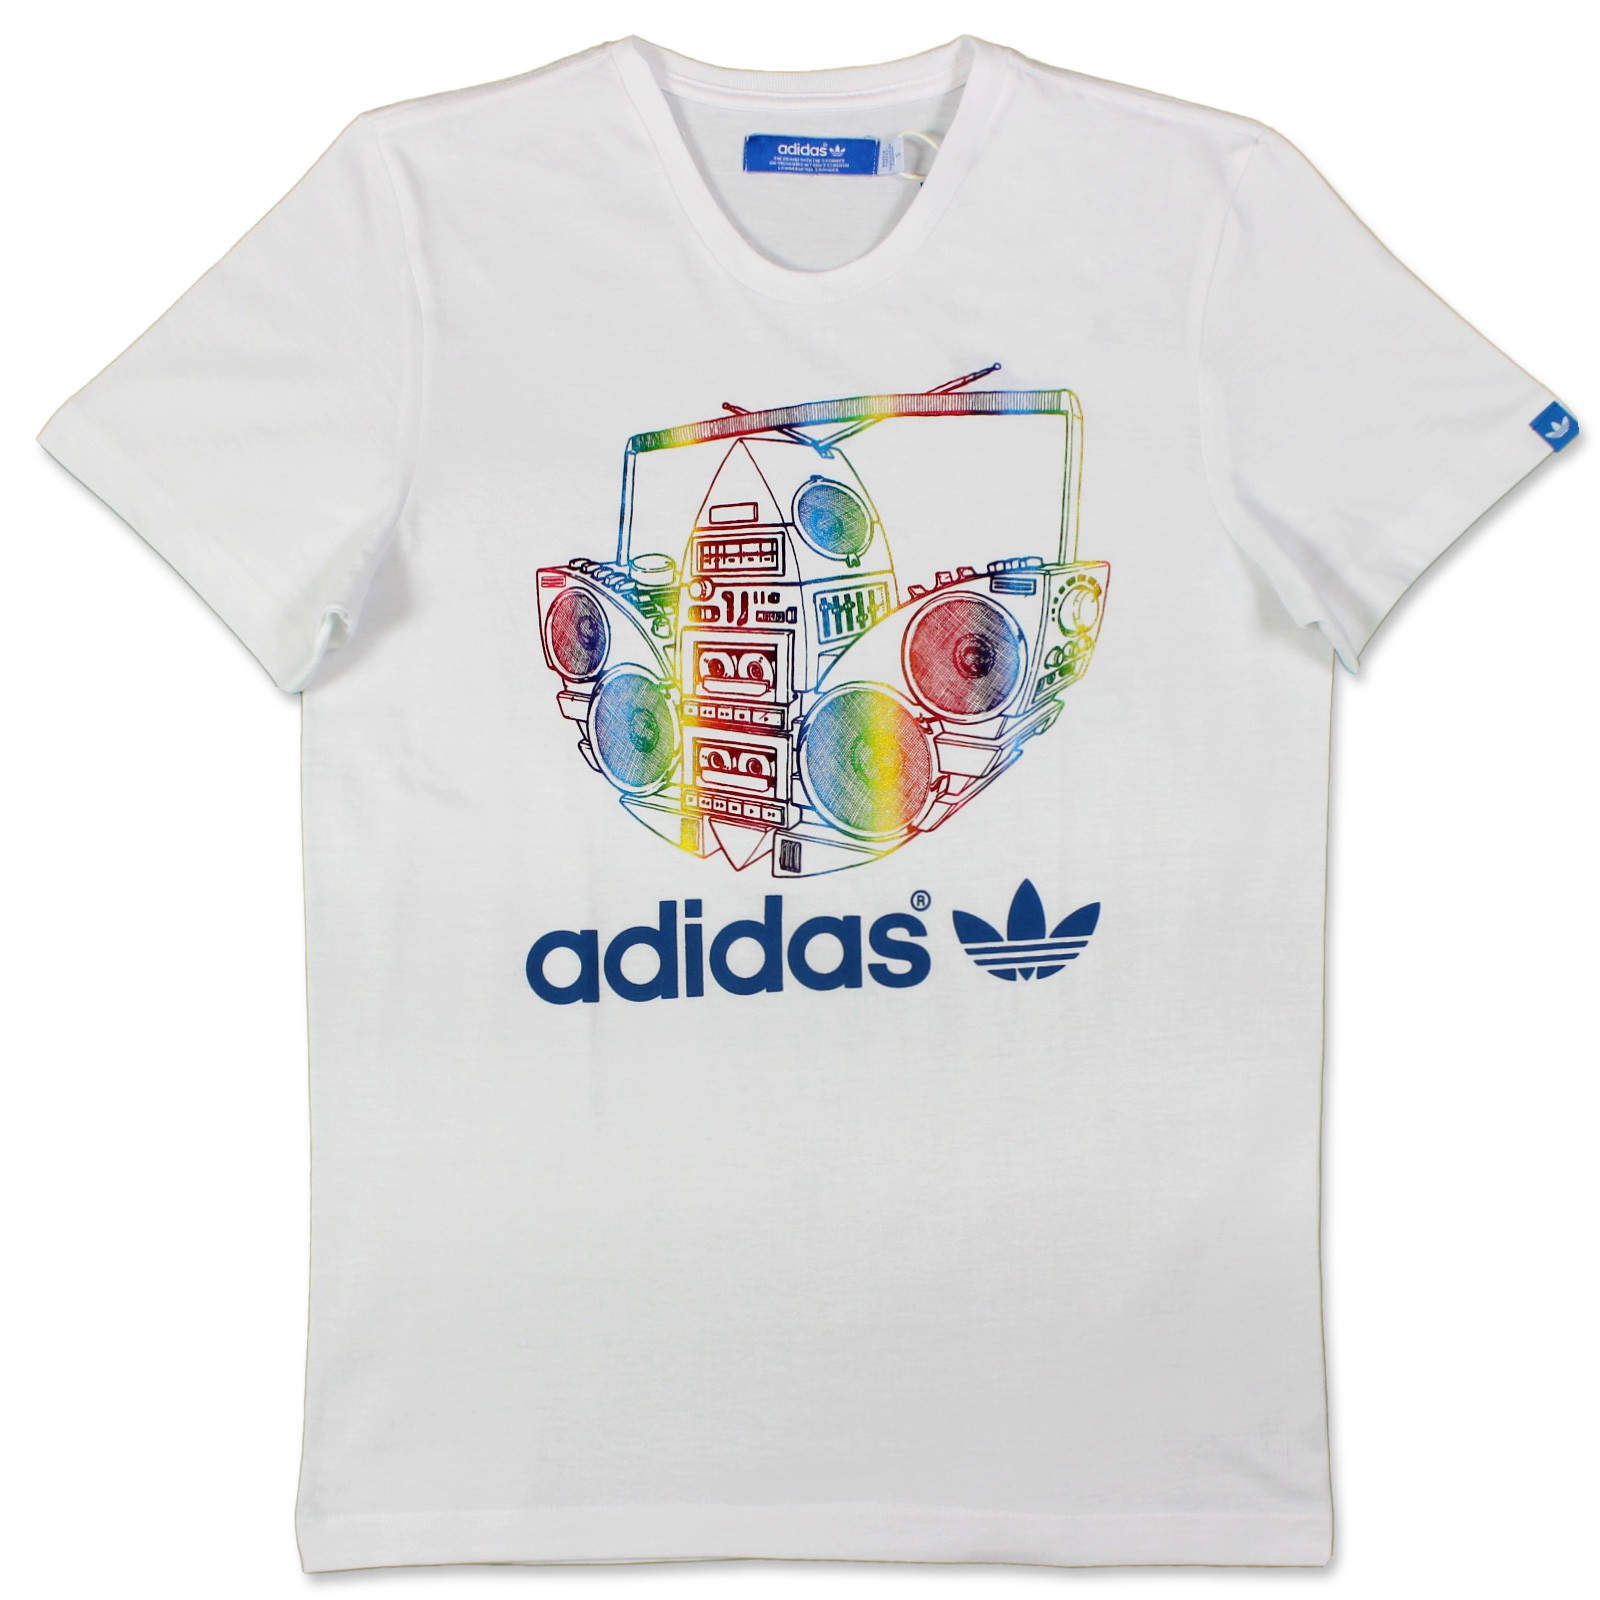 Details about Adidas Originals Trefoil Tee Mens Casual 80er T Shirt Special Edition XS XXL show original title